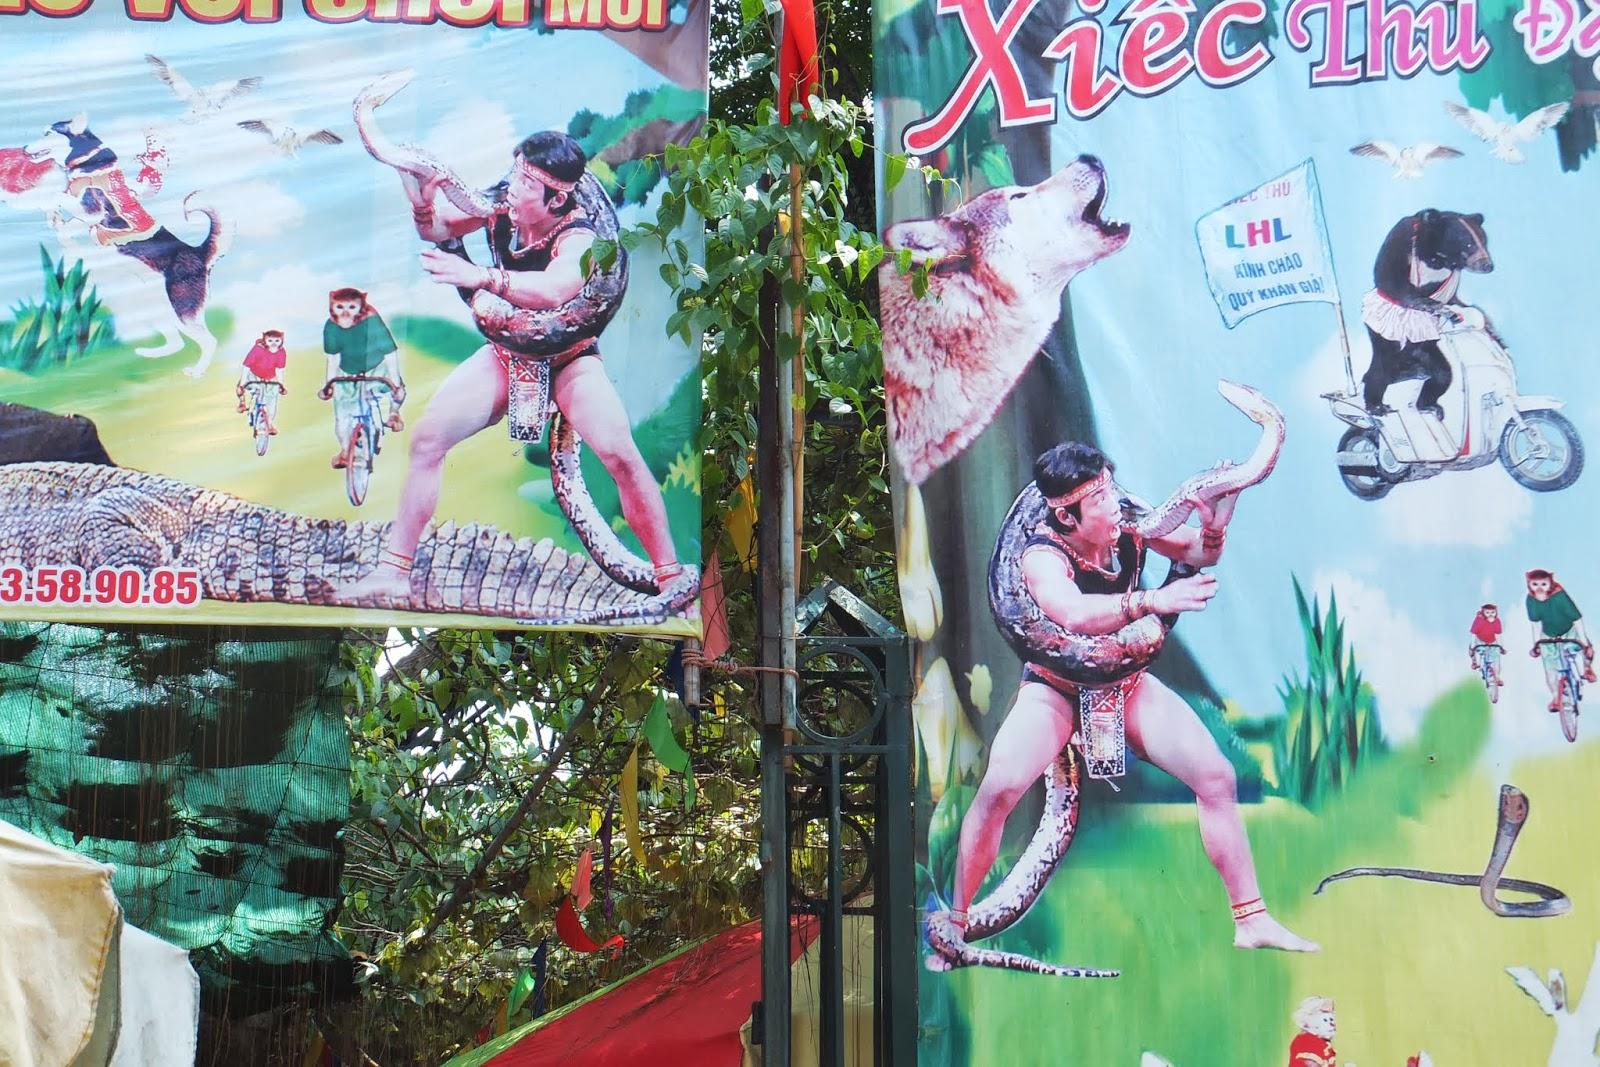 hanoi-zoo-snake ハノイ動物園のヘビ使い